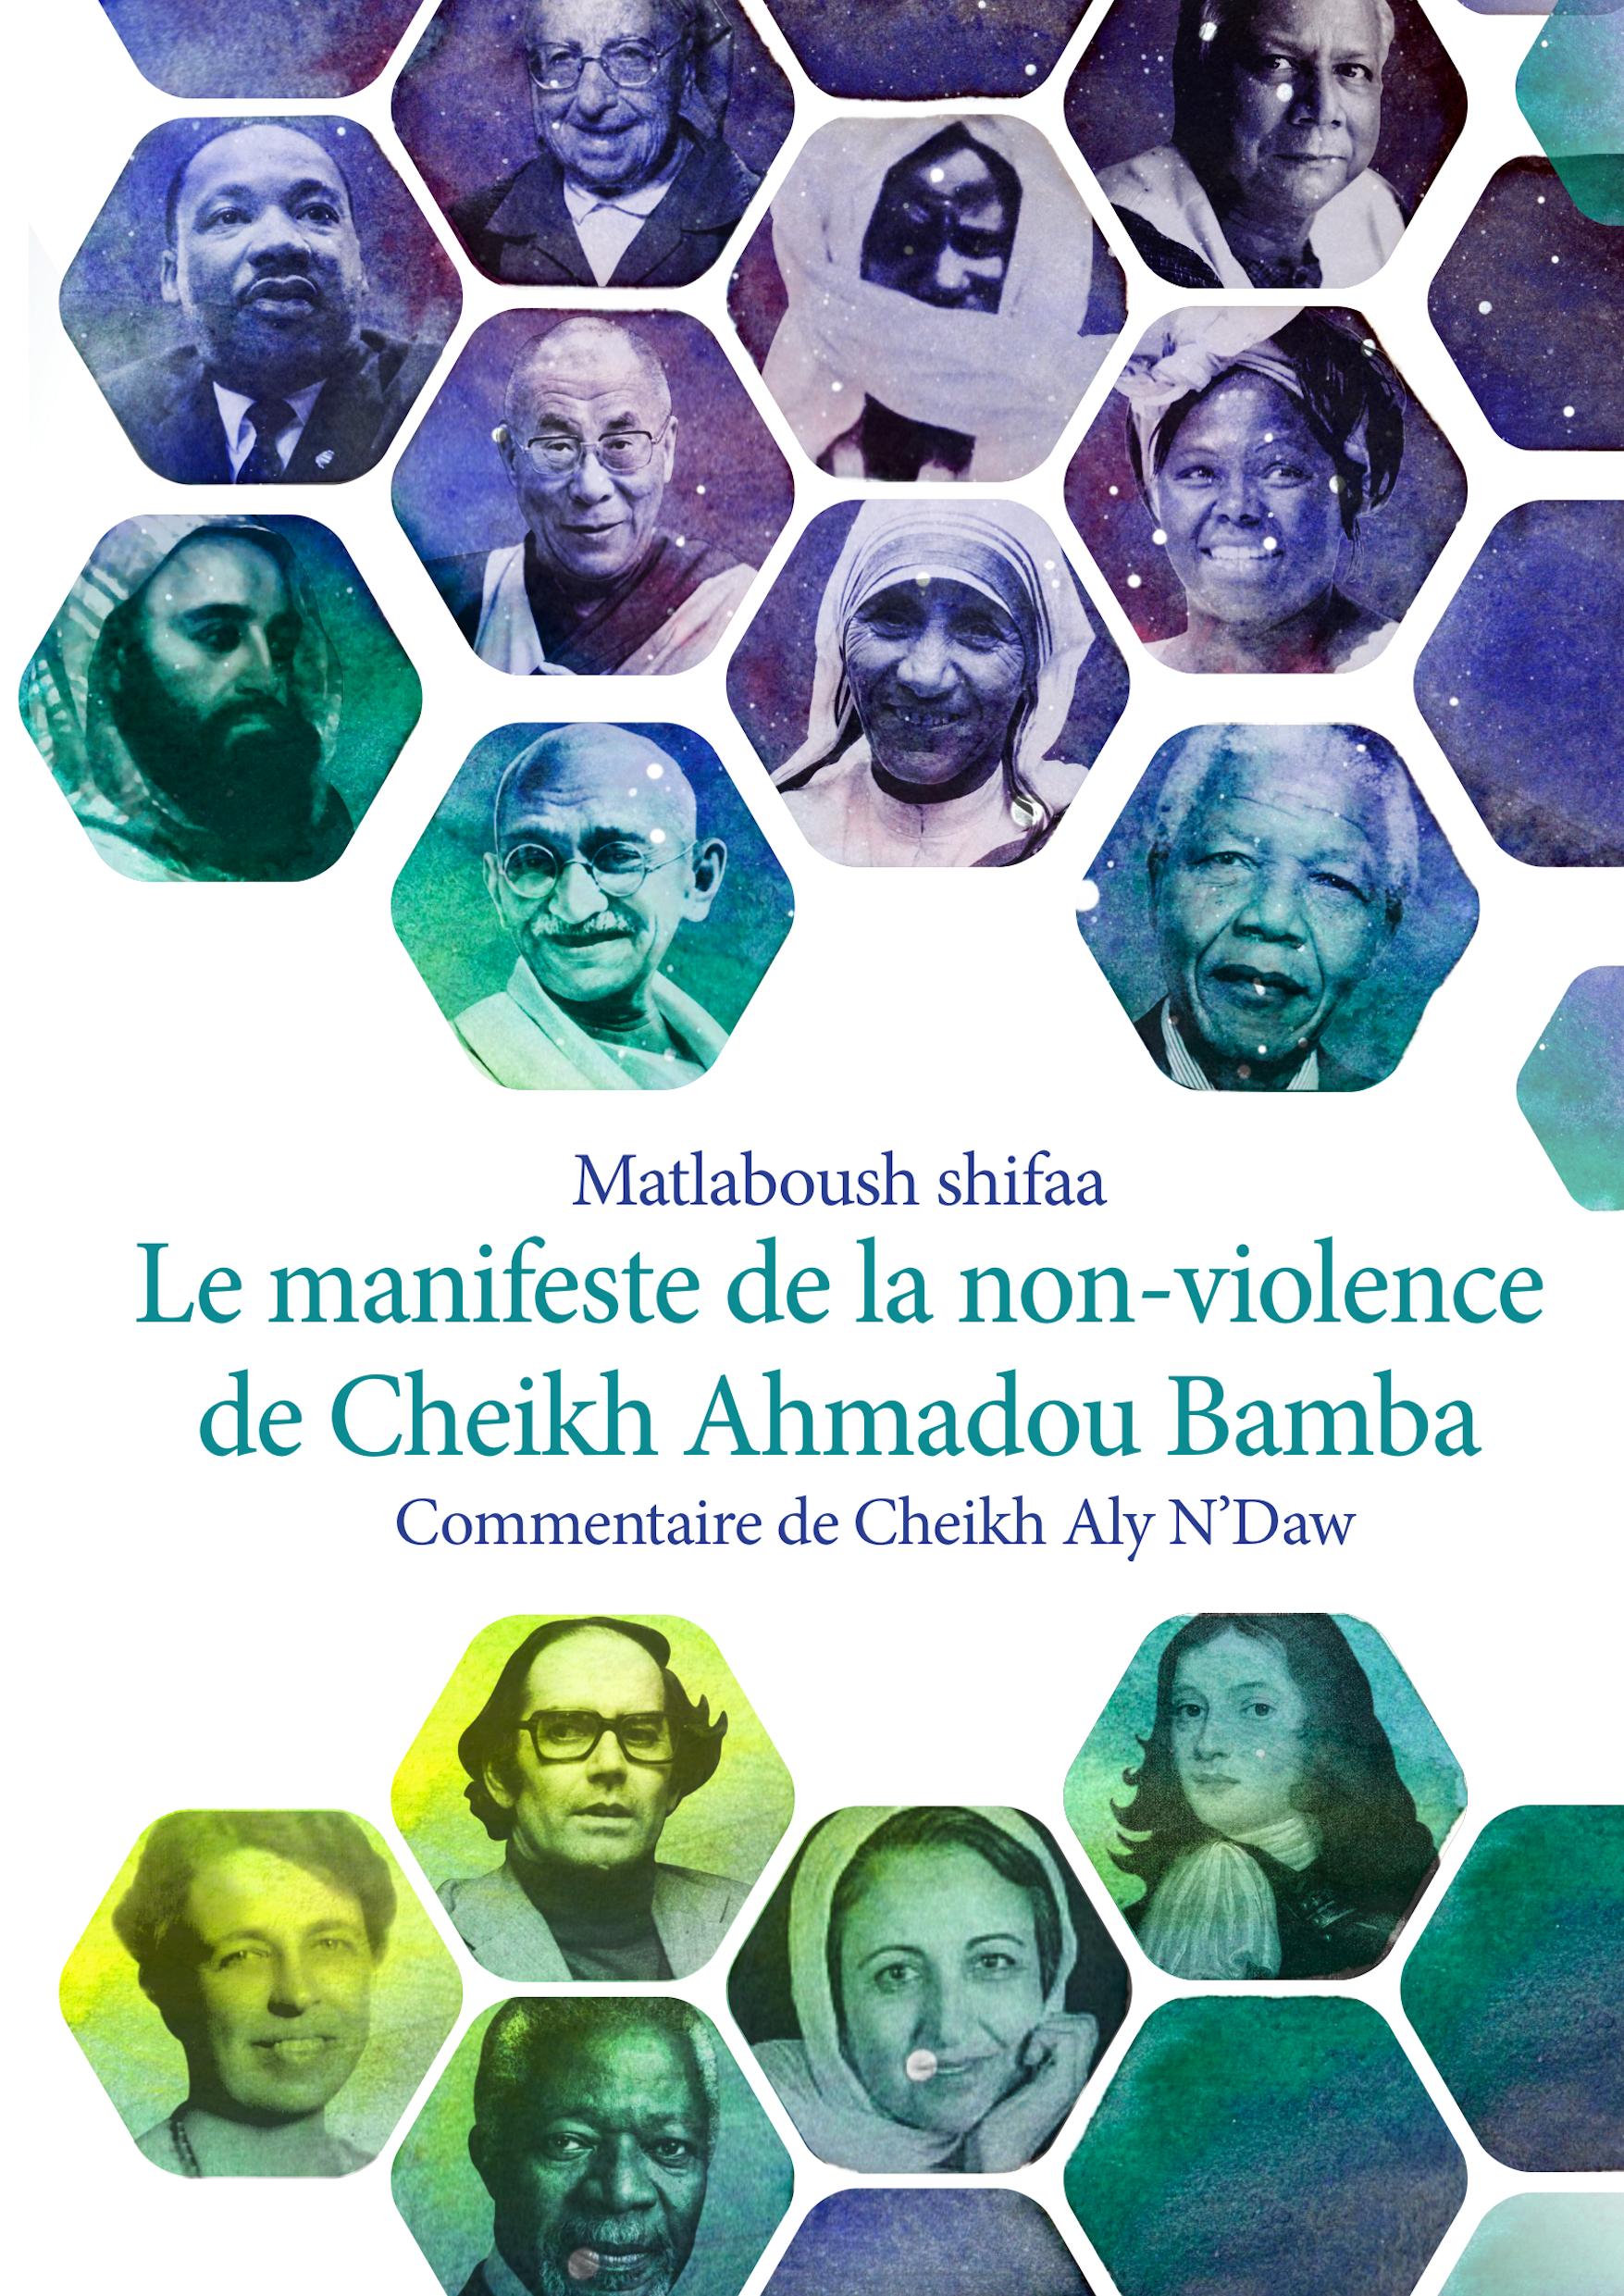 Le manifeste de la non-violence